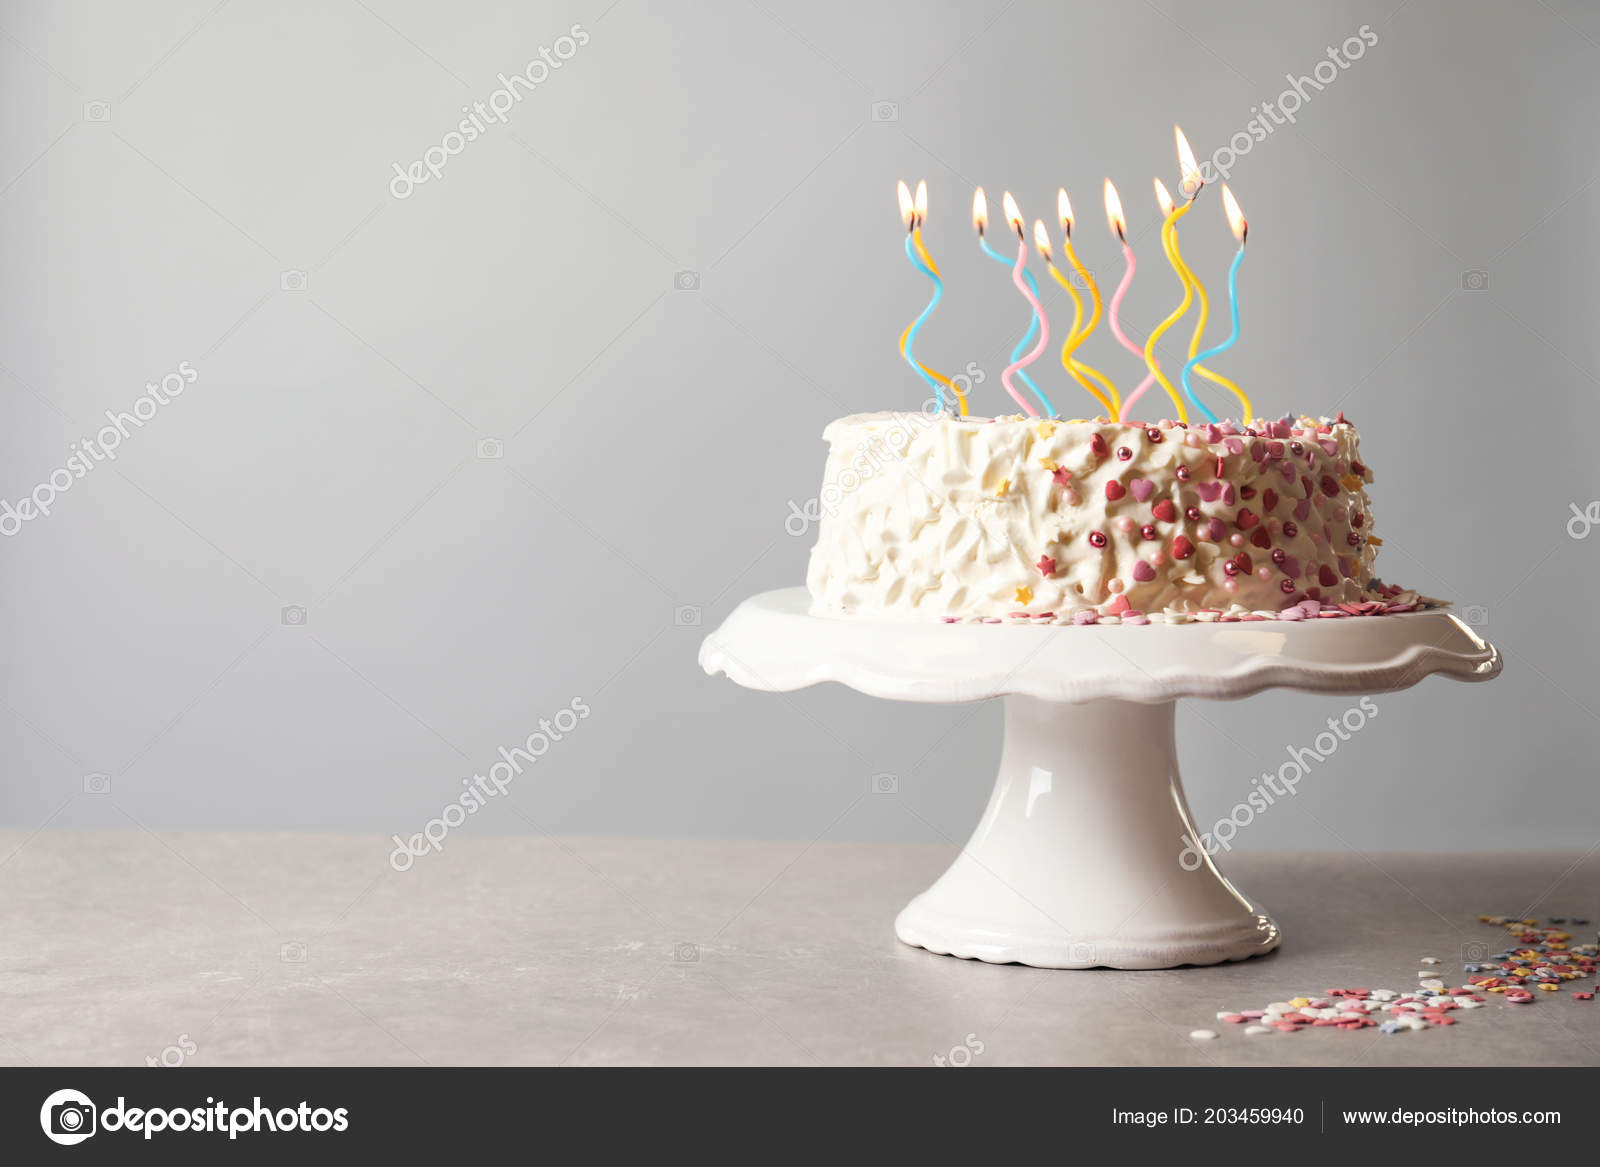 Enjoyable Birthday Cake Candles Table Gray Background Stock Photo Funny Birthday Cards Online Elaedamsfinfo